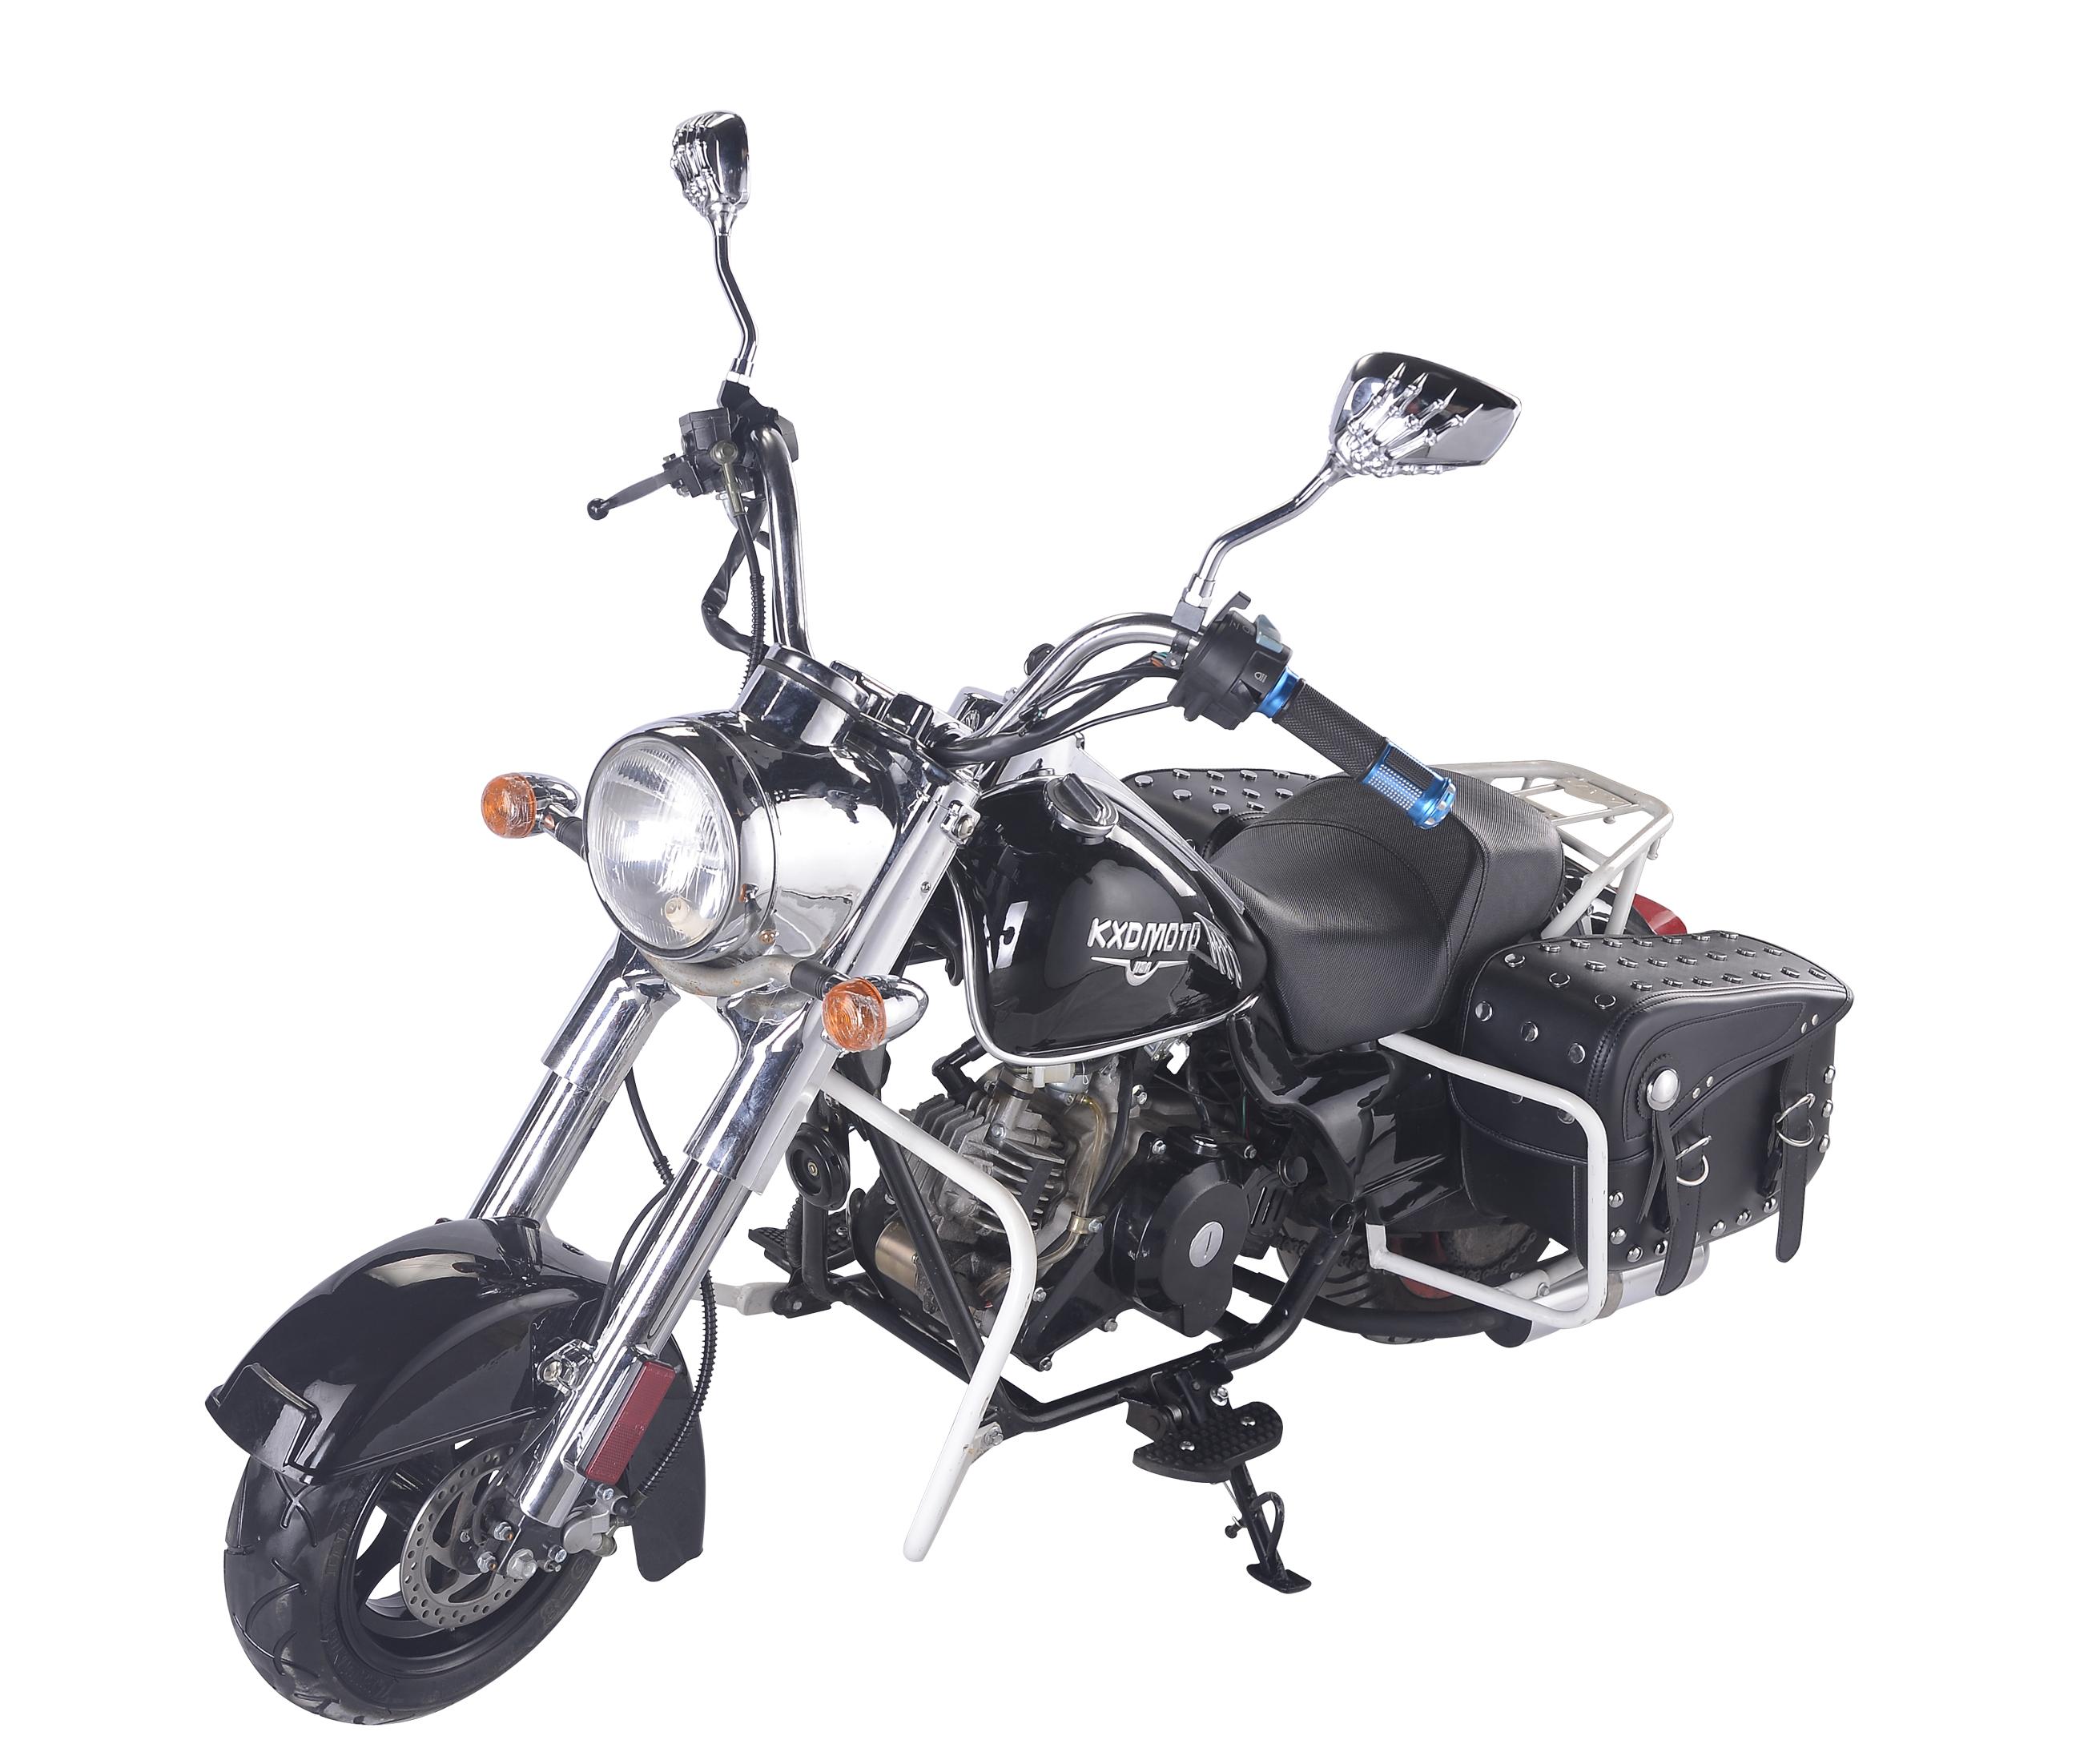 Chinesische Mini Chopper 20cc Motorrad Bike   Buy Kinder Dirt ...